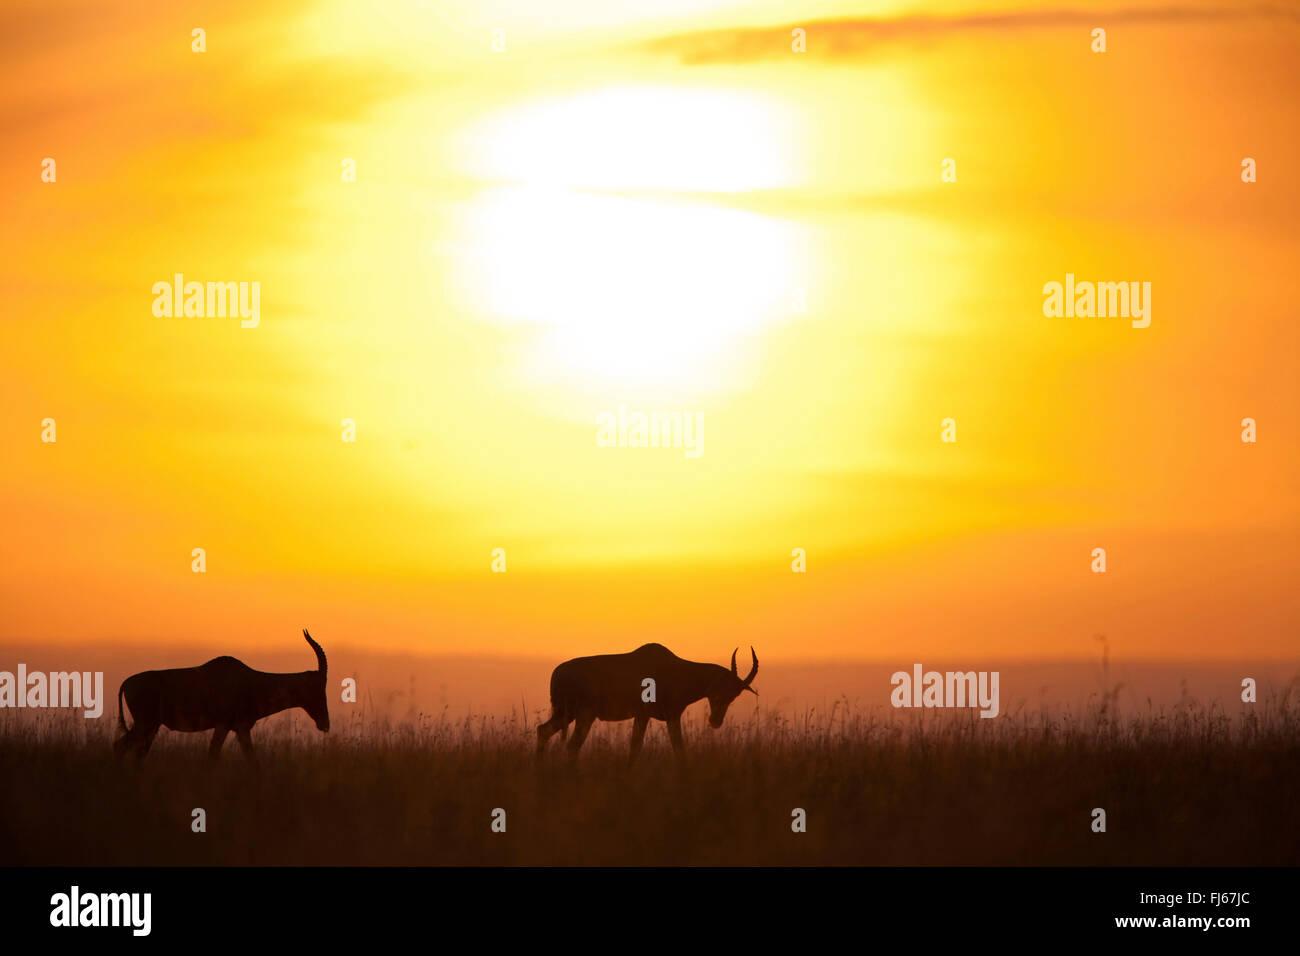 topi, tsessebi, korrigum, tsessebe (Damaliscus lunatus jimela), silhouettes of two topis at sunset, Kenya, Masai - Stock Image